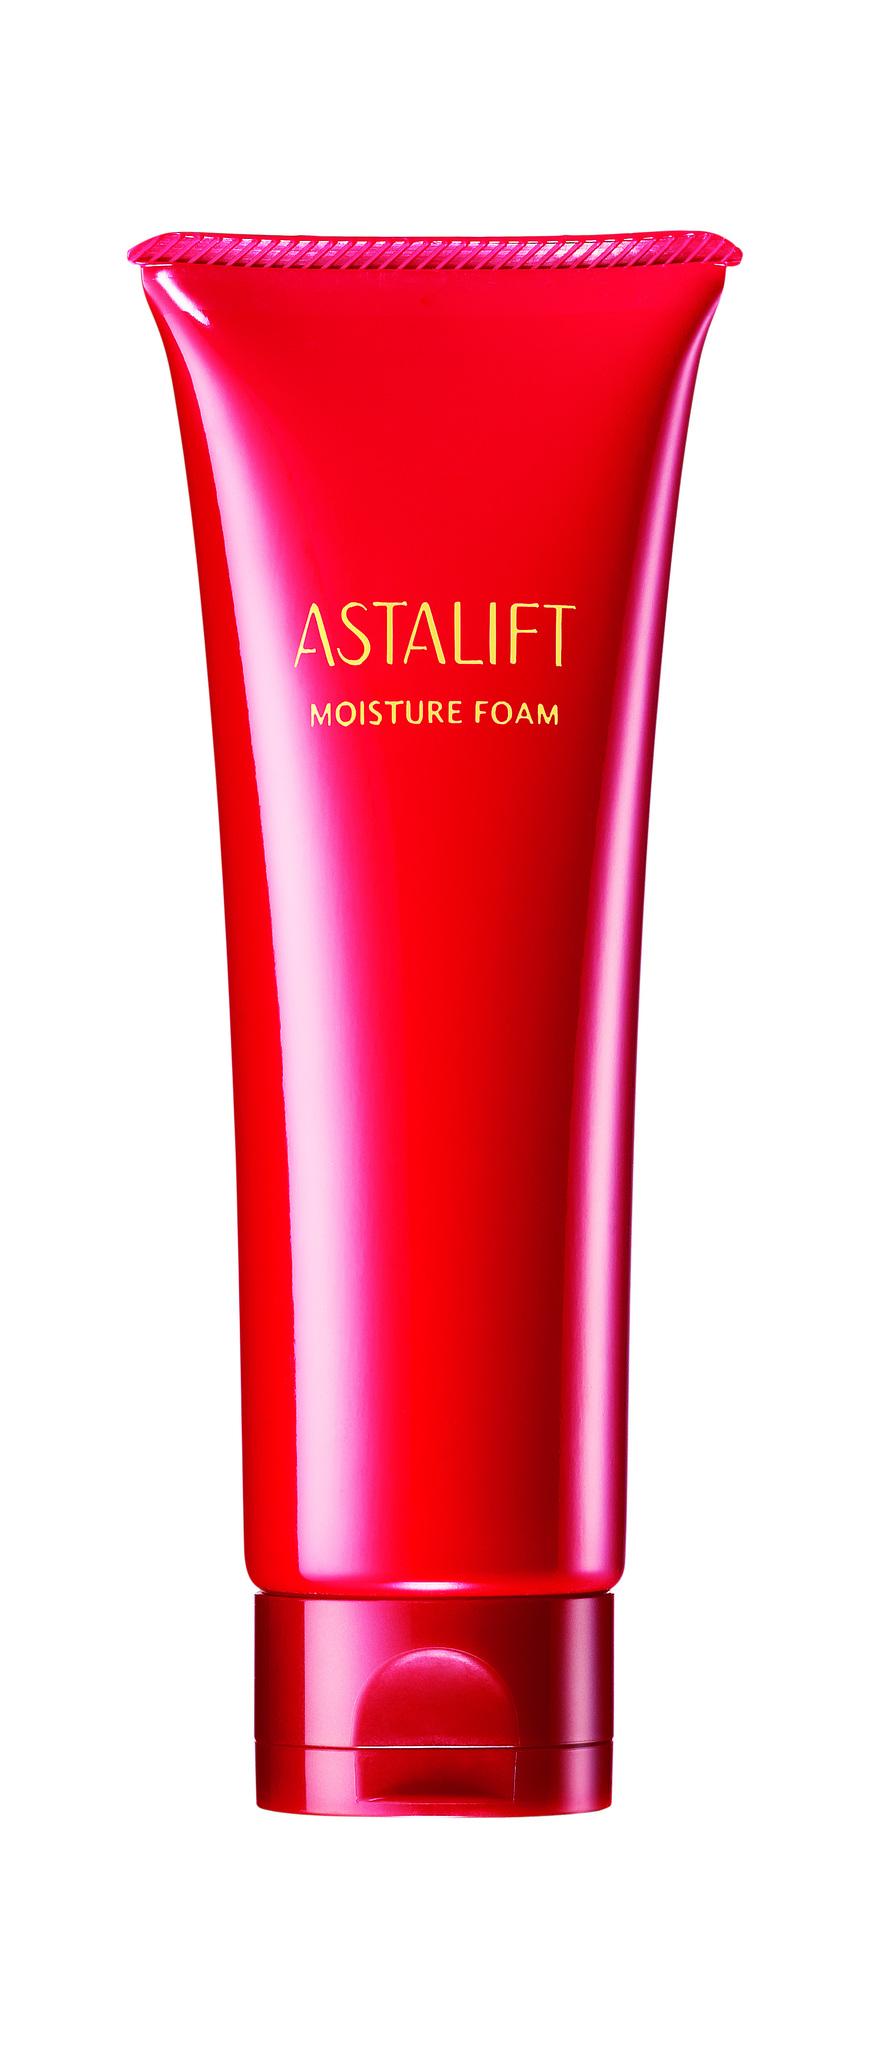 ASTALIFT Moisture Foam Увлажняющая пенка для умывания, 100 гр